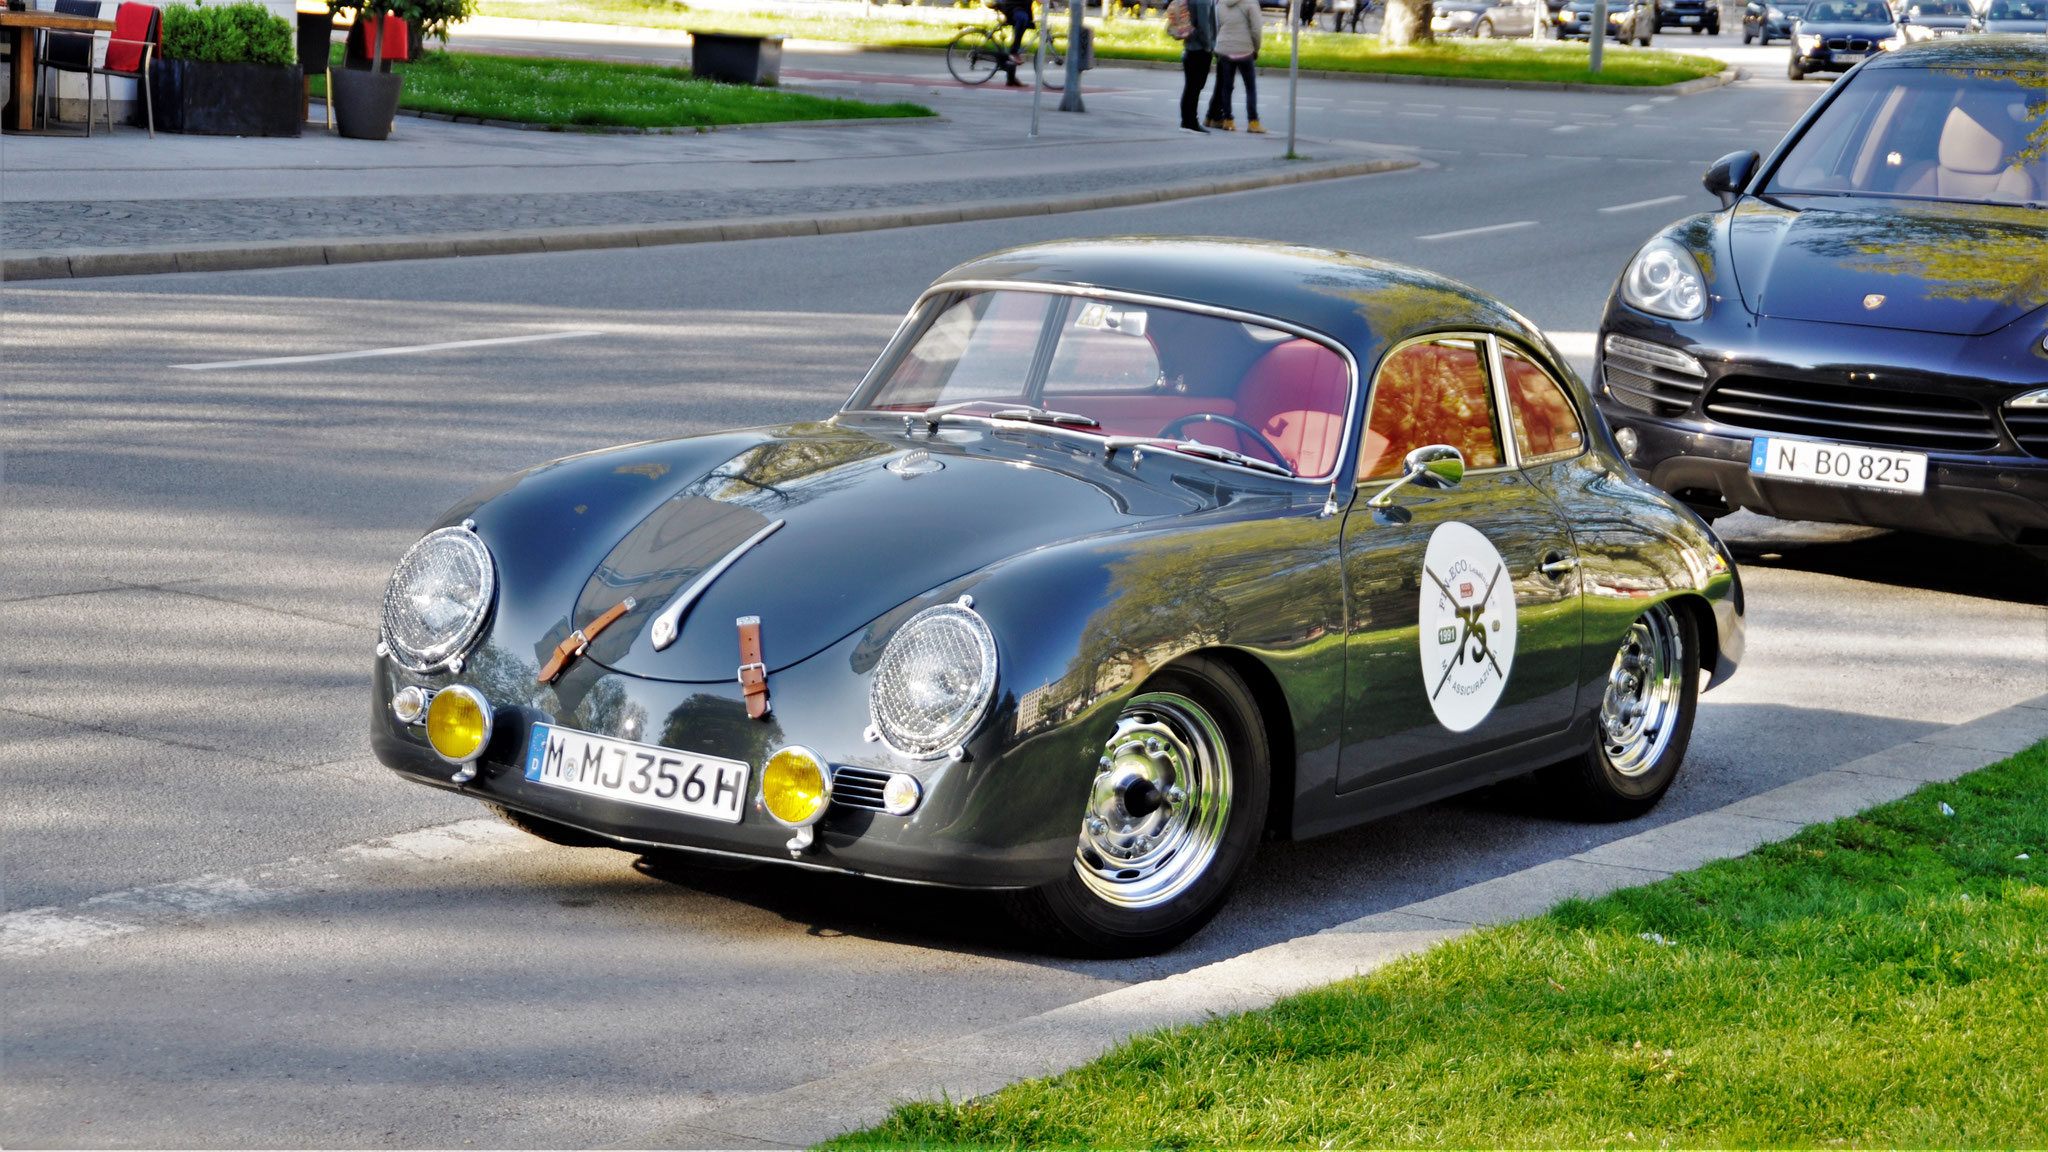 Porsche 356 1600 Super - M-MJ-356H